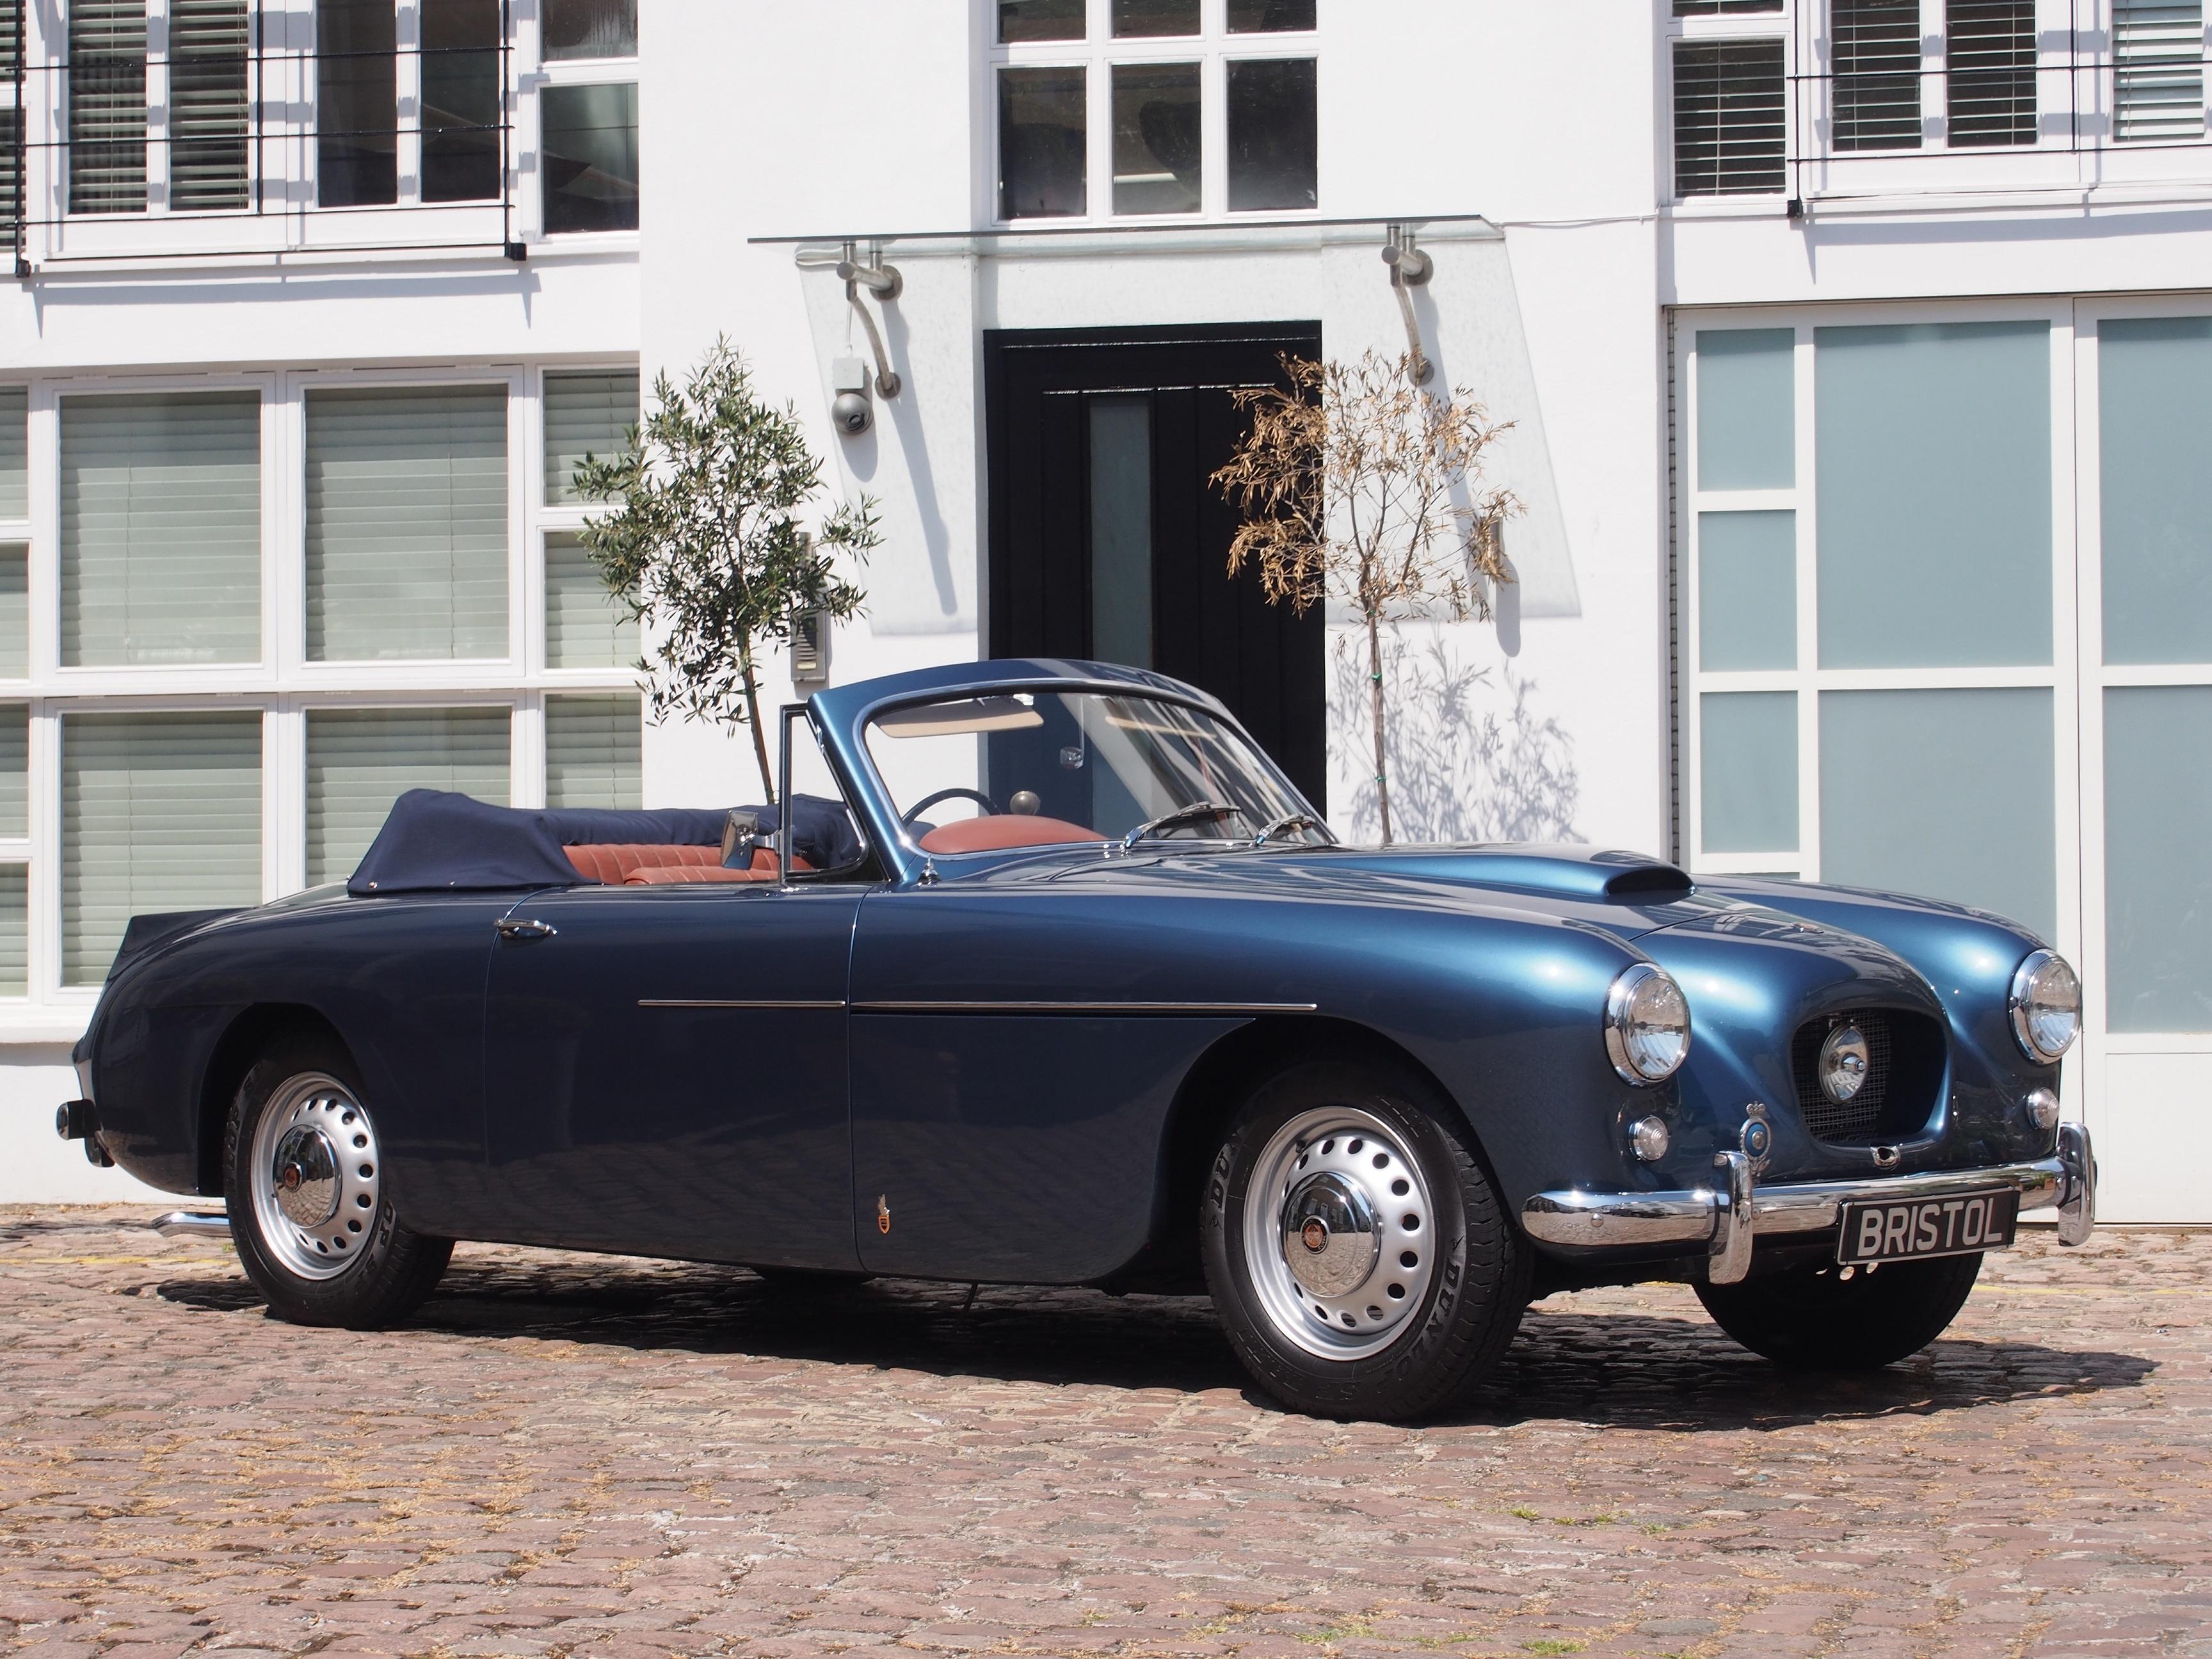 1956_Bristol_405_Drop_Head_Coupe.jpg